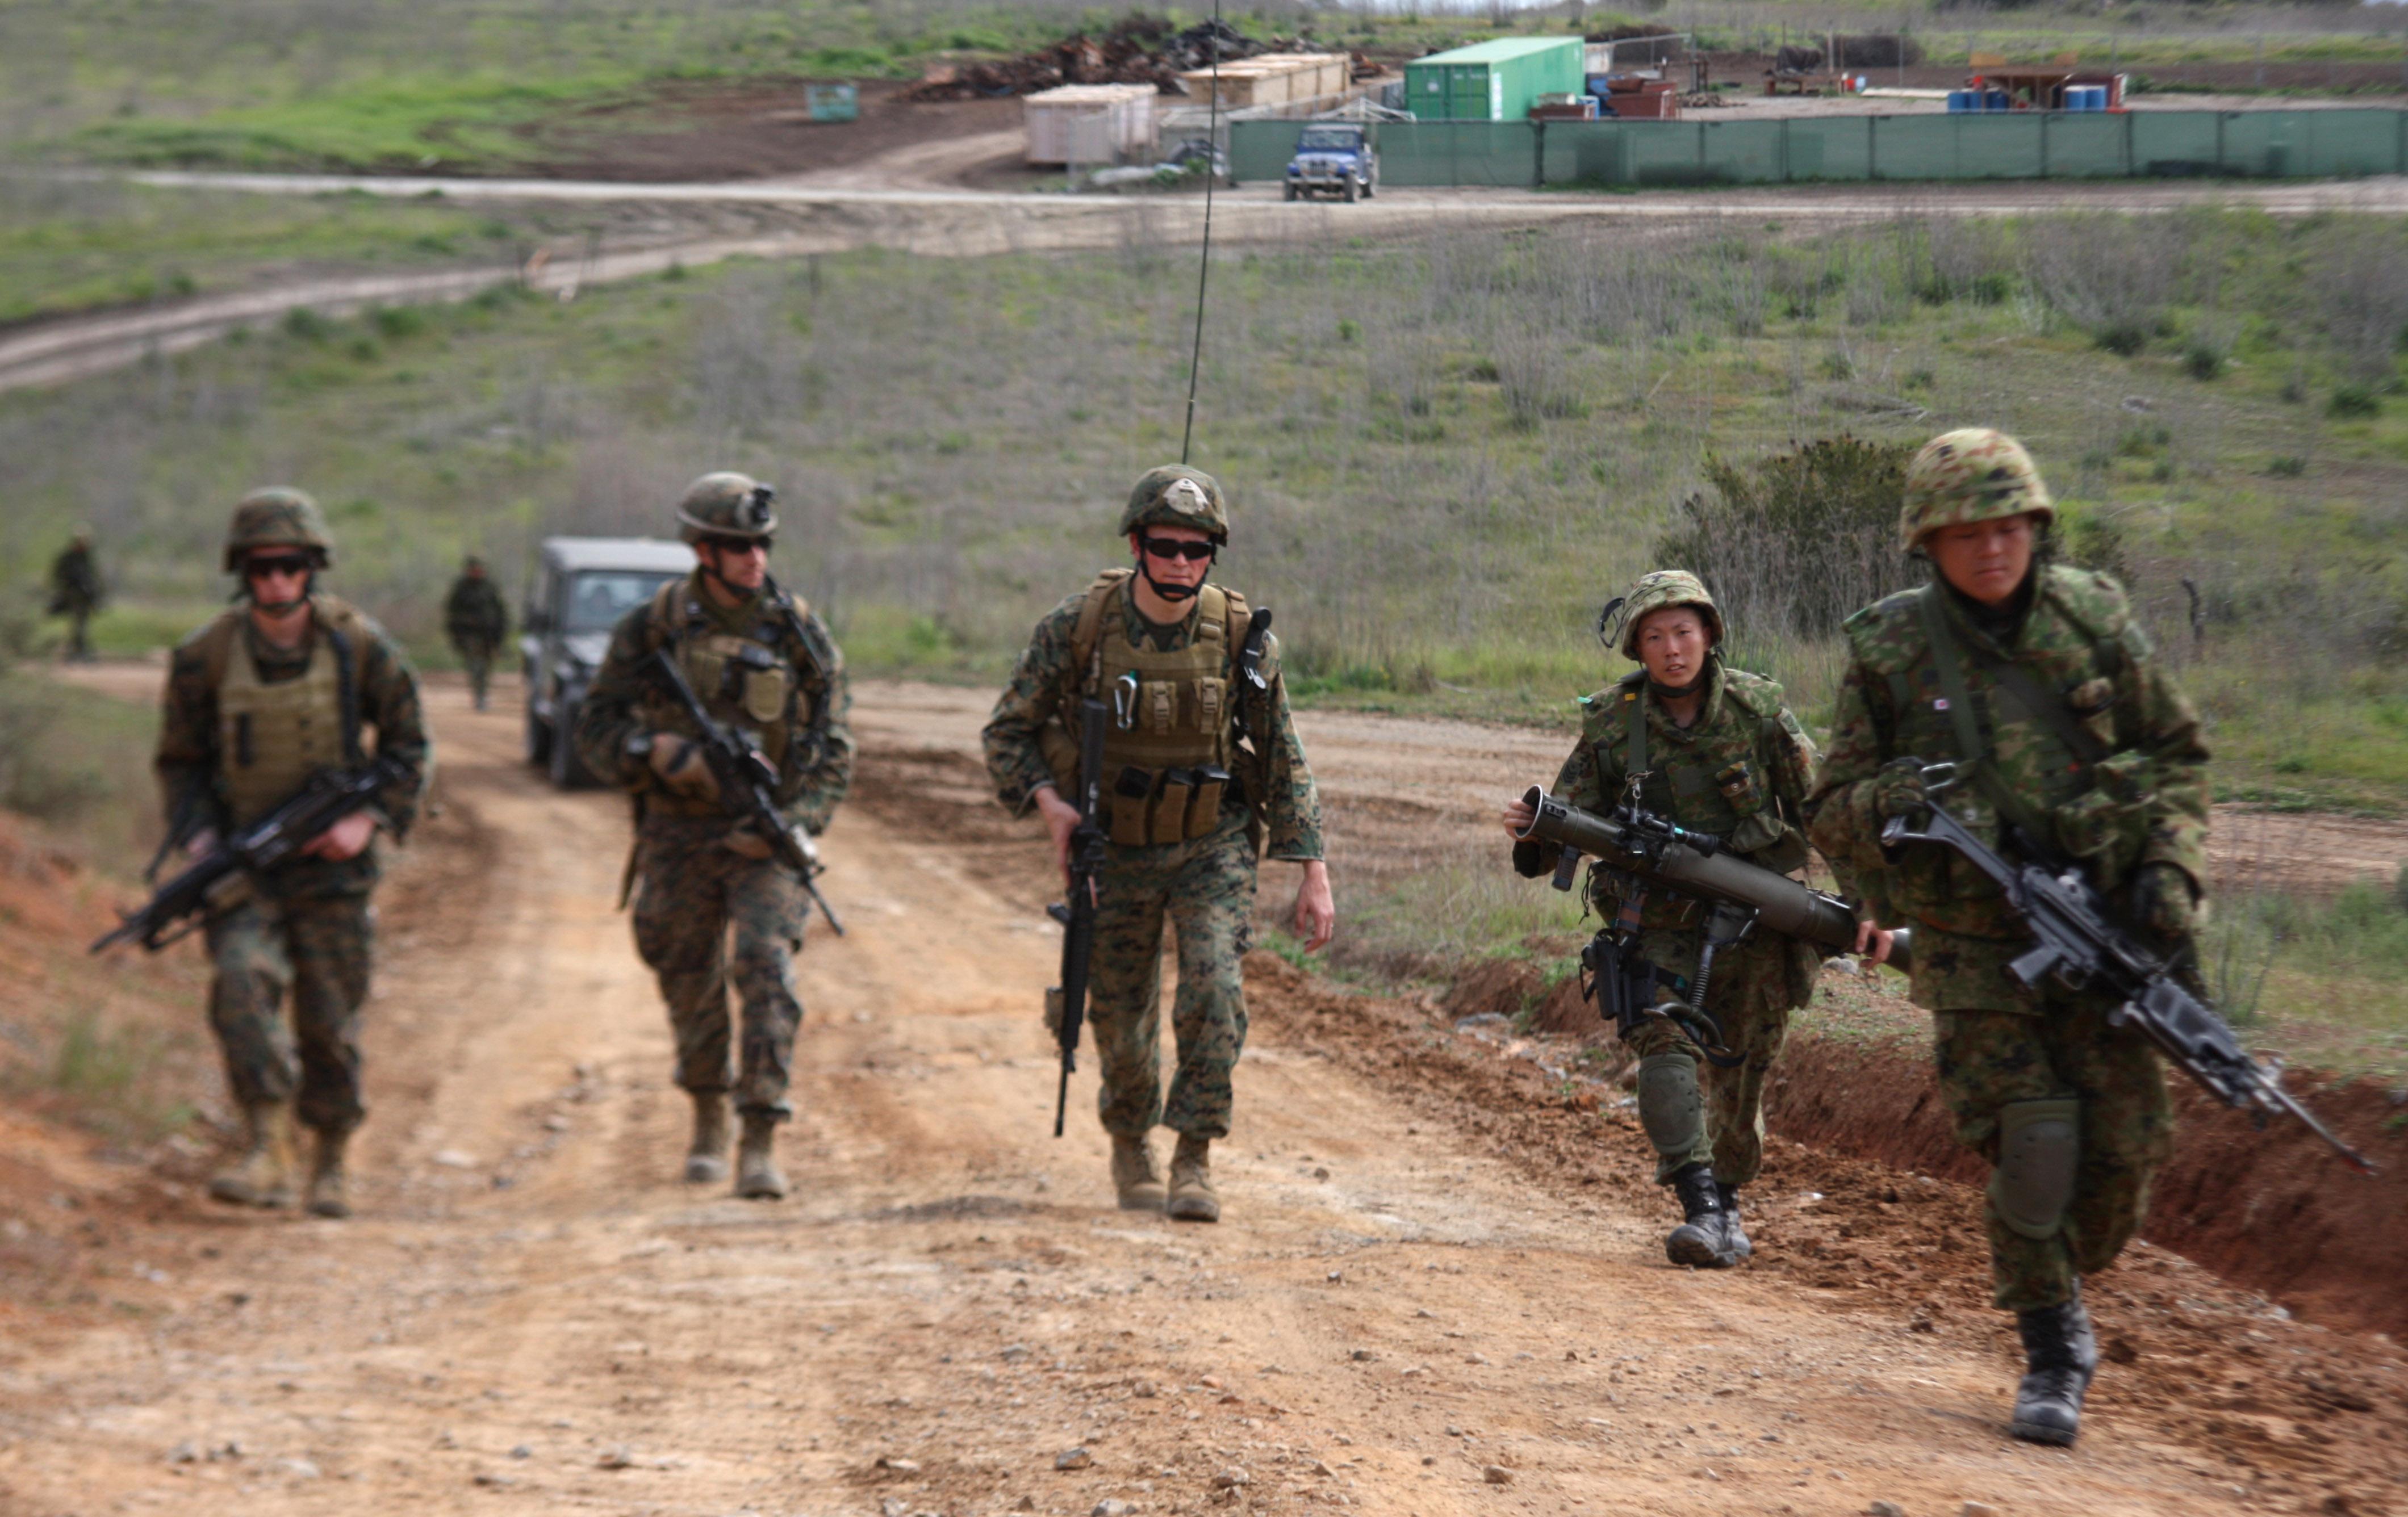 File:Defense.gov News Photo 110215-M-0564A-030 - U.S ...